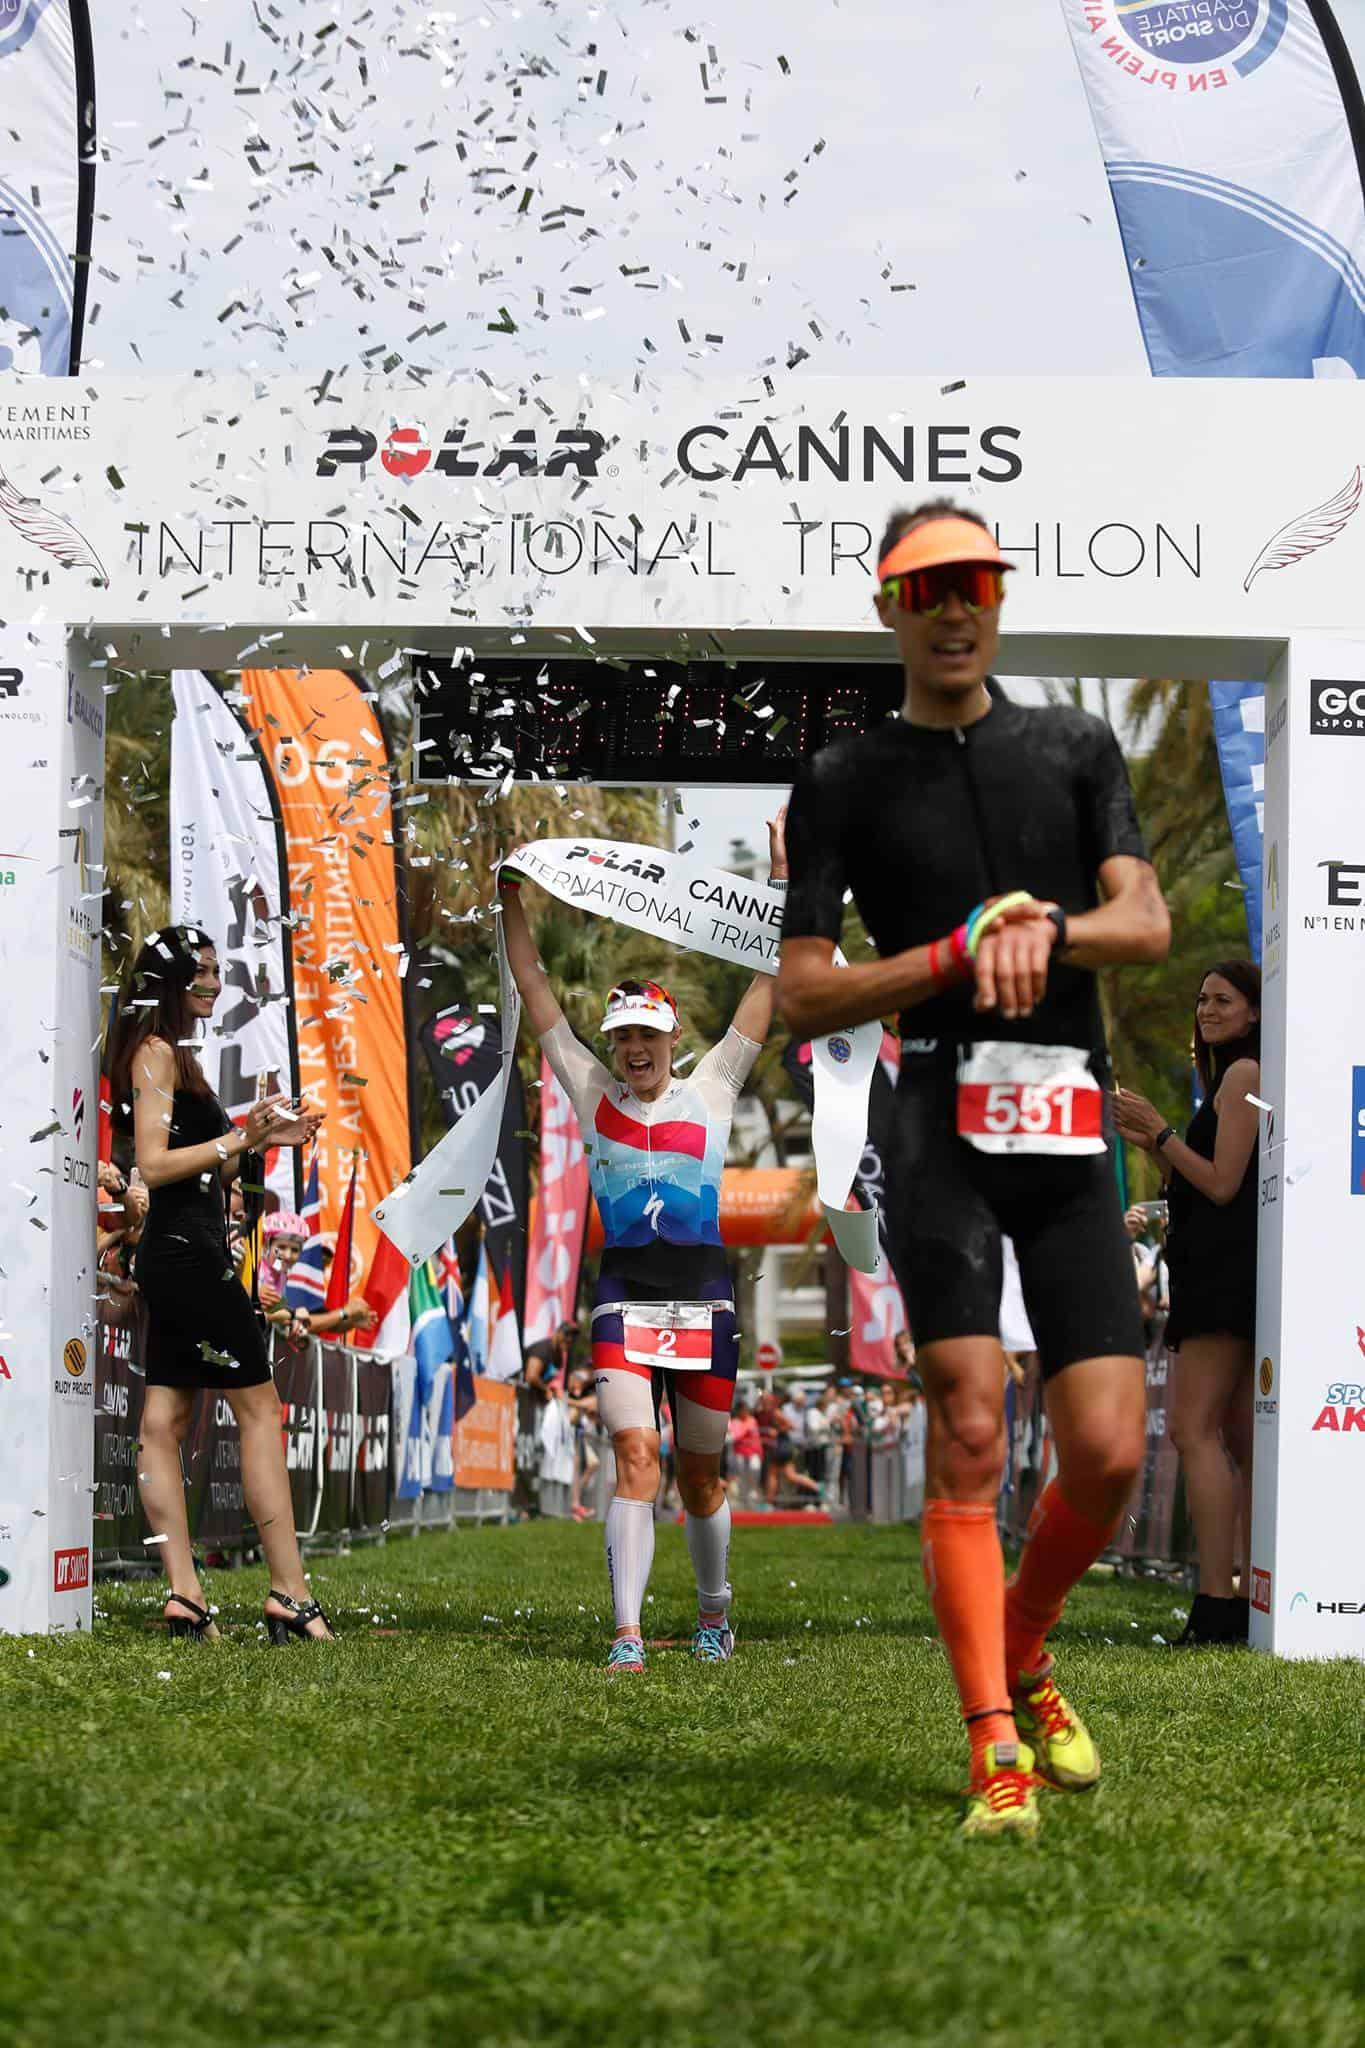 polar cannes international triathlon lucy charles nicolas raybaud specialized